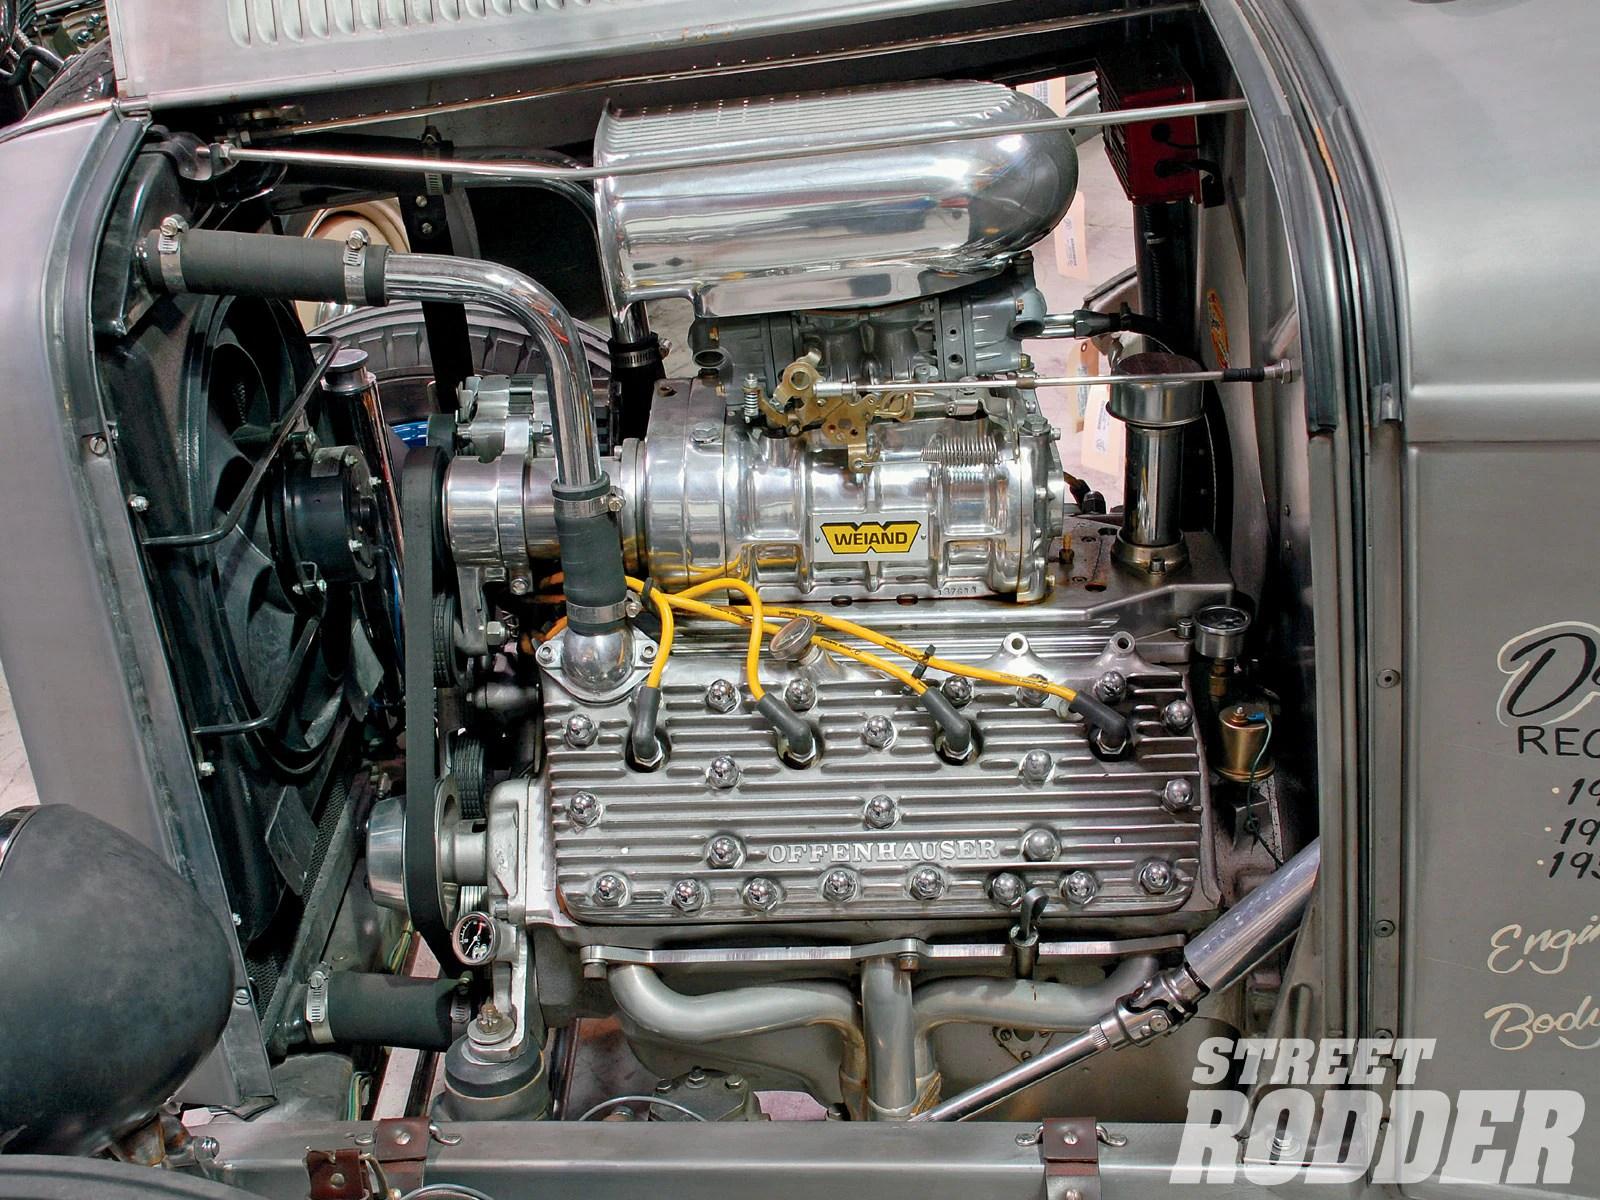 hight resolution of flathead ford engines internal diagrams wiring diagram database flathead ford engines internal diagrams